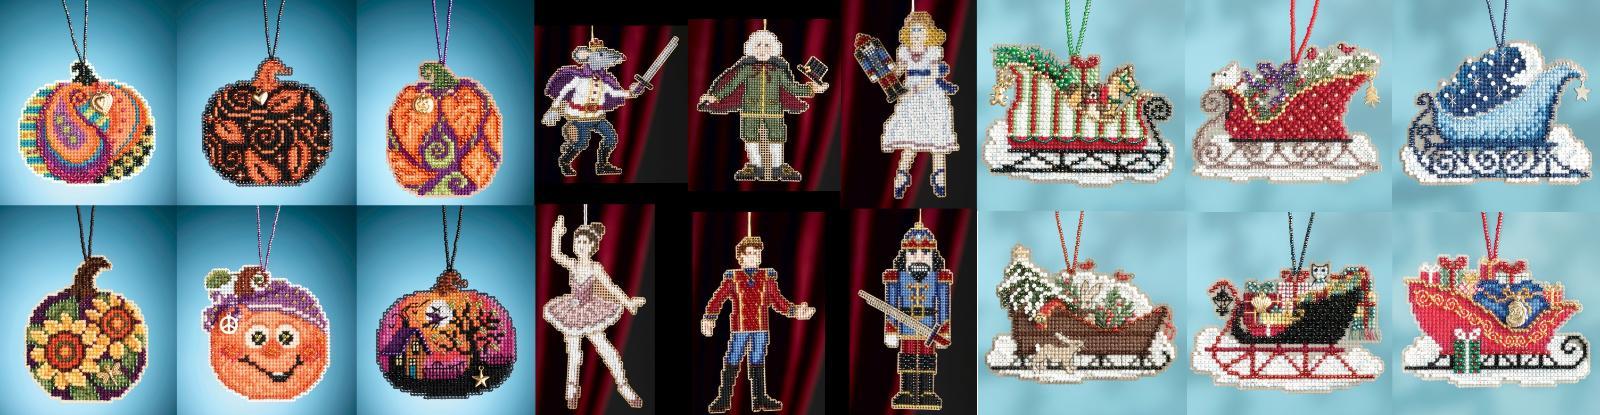 sleigh ride charmed ornaments cross stitch kits